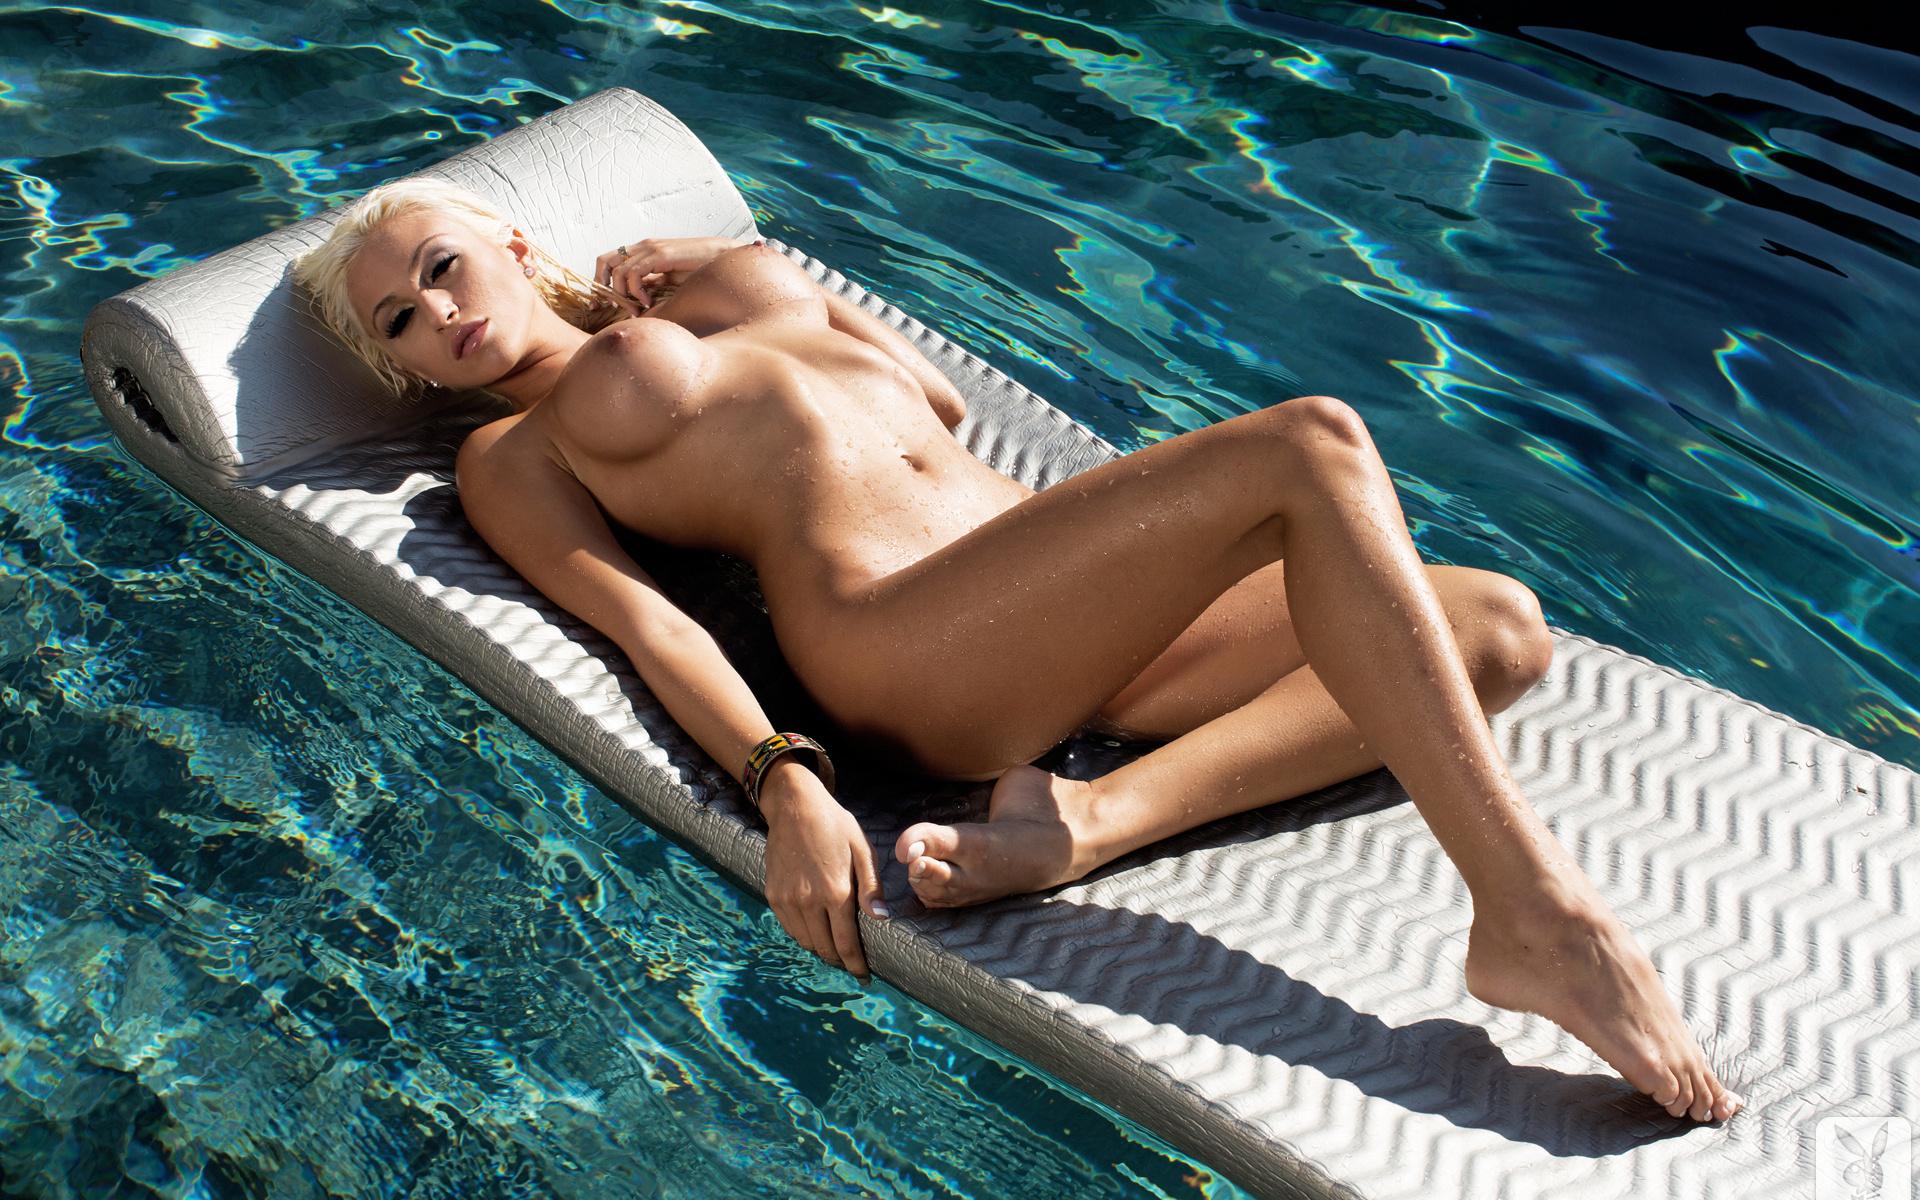 paren-prishel-pokupat-doma-blondinka-porno